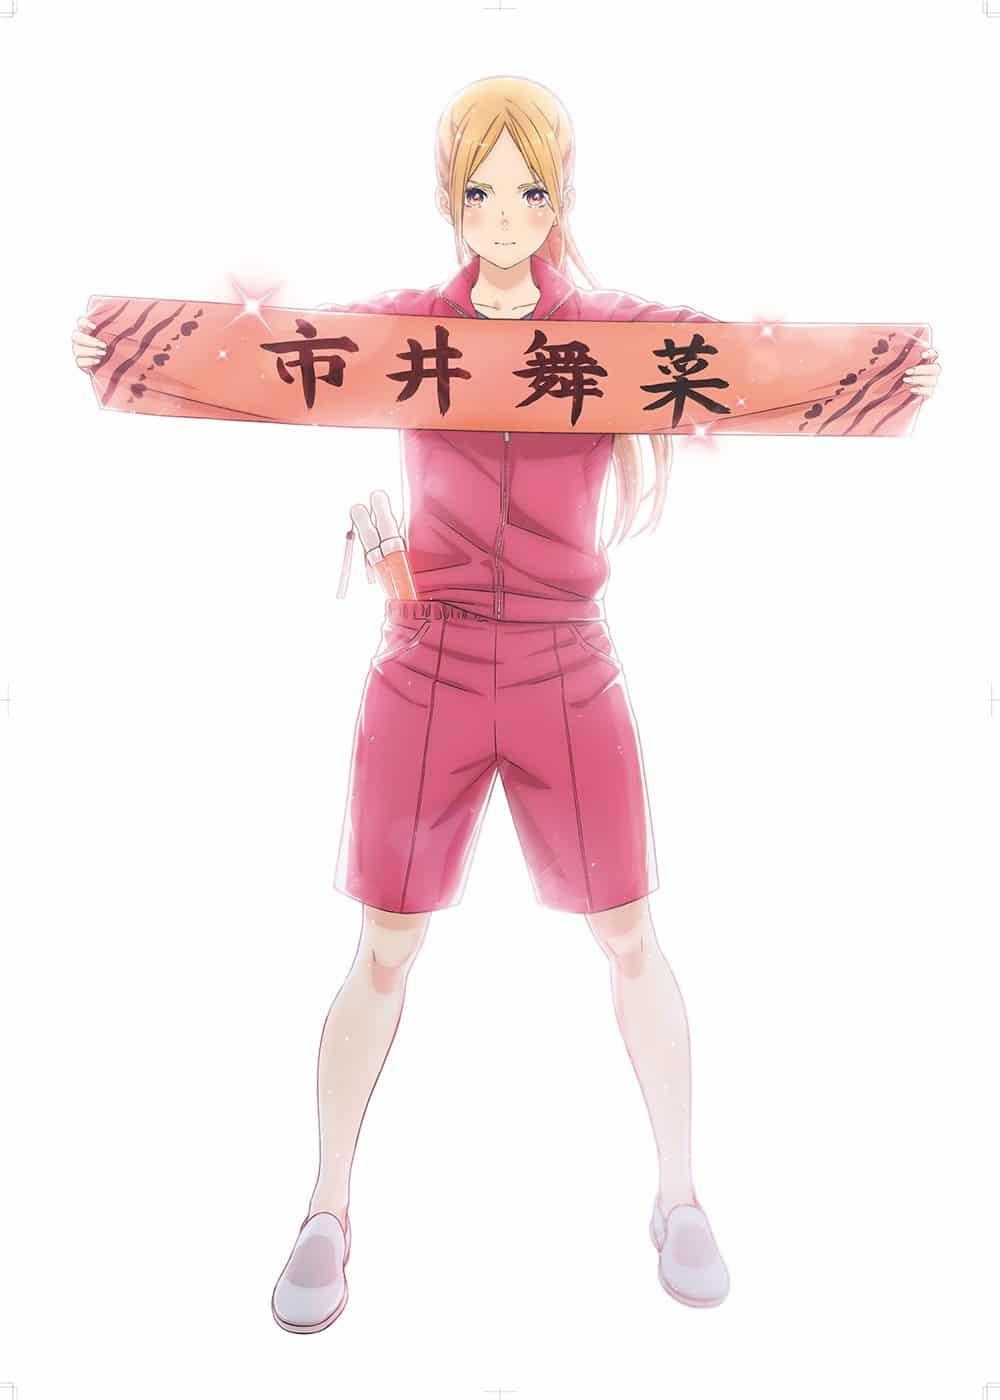 El anime Oshi ga Budoukan Ittekuretara Shinu revela su primer tráiler